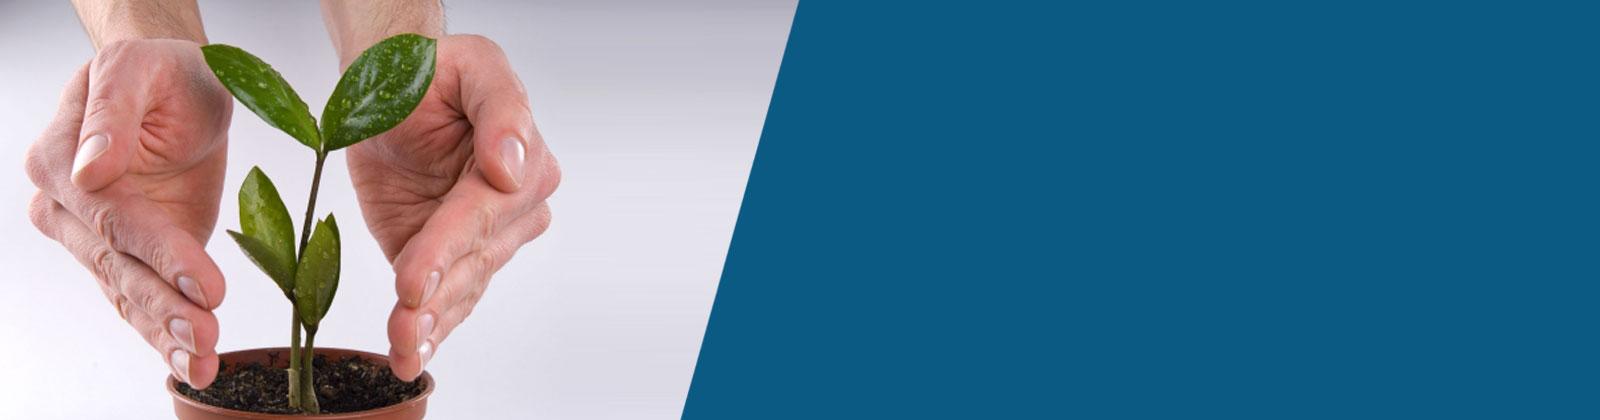 For seamless p2p lending and p2p borrowing, register www.omlp2p.com